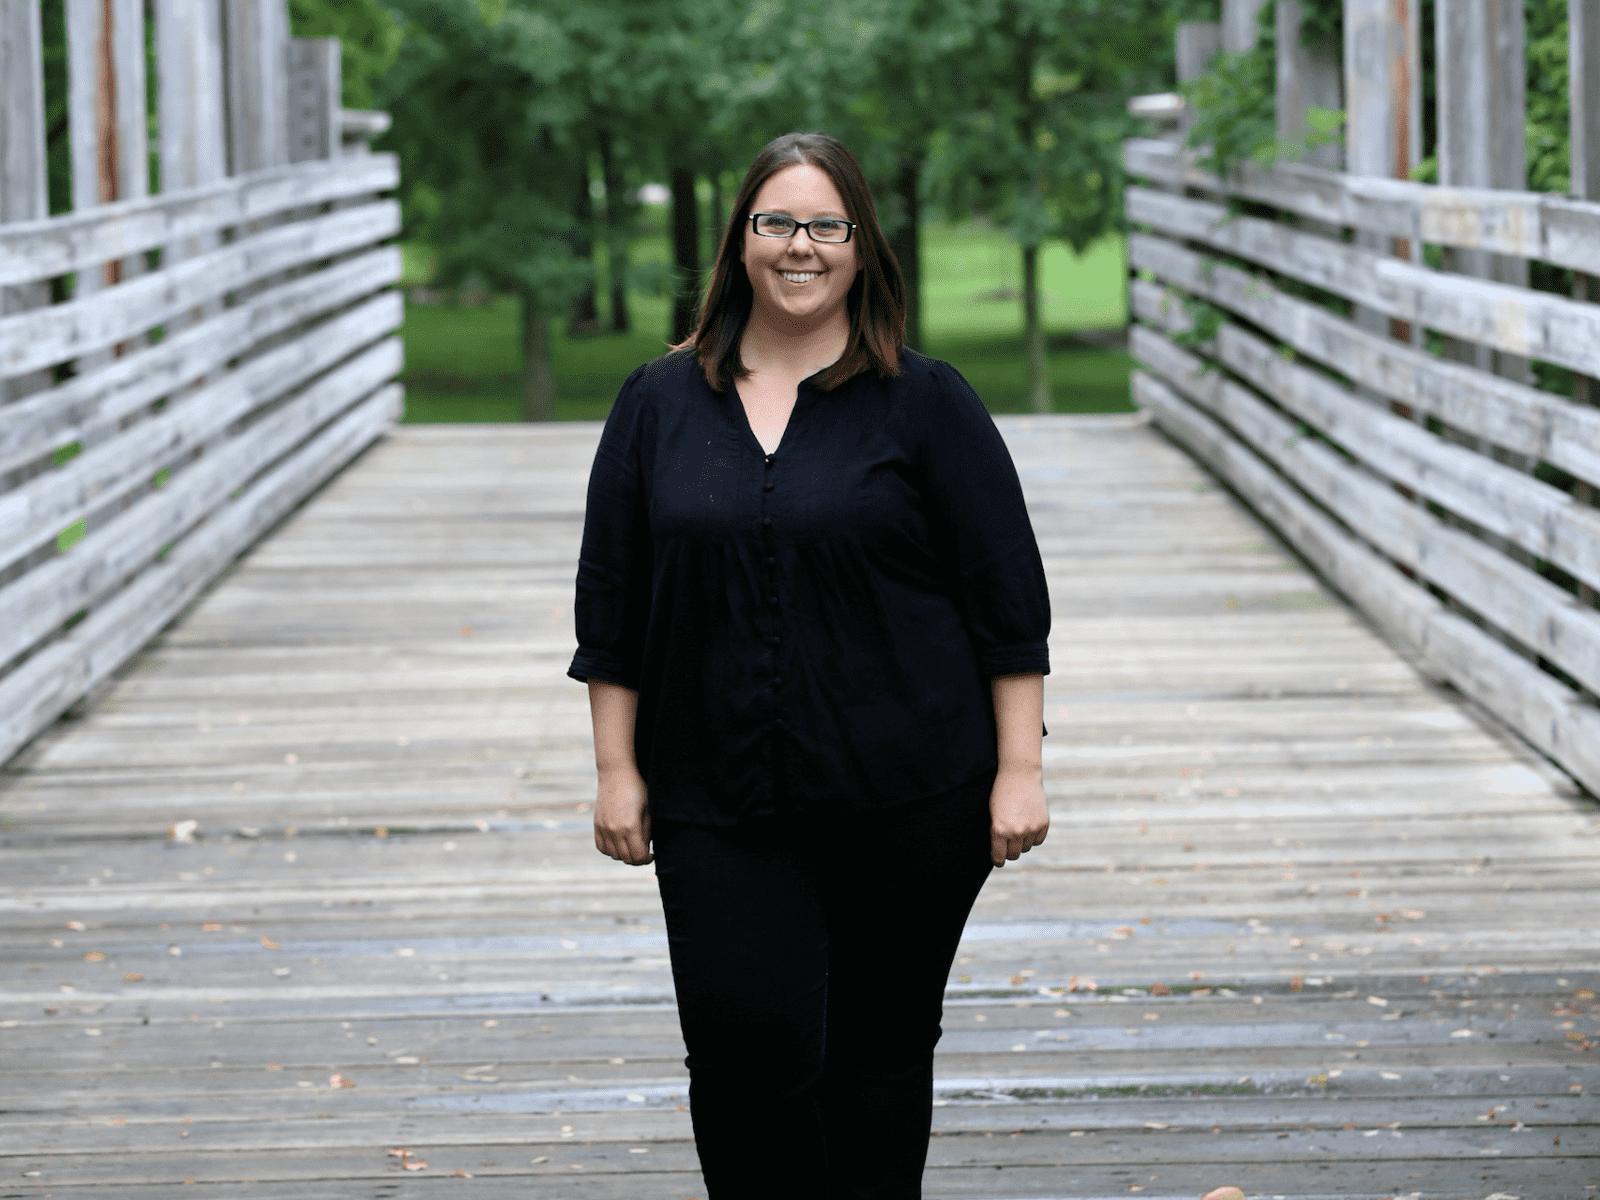 Melissa from Brampton, Ontario, Canada